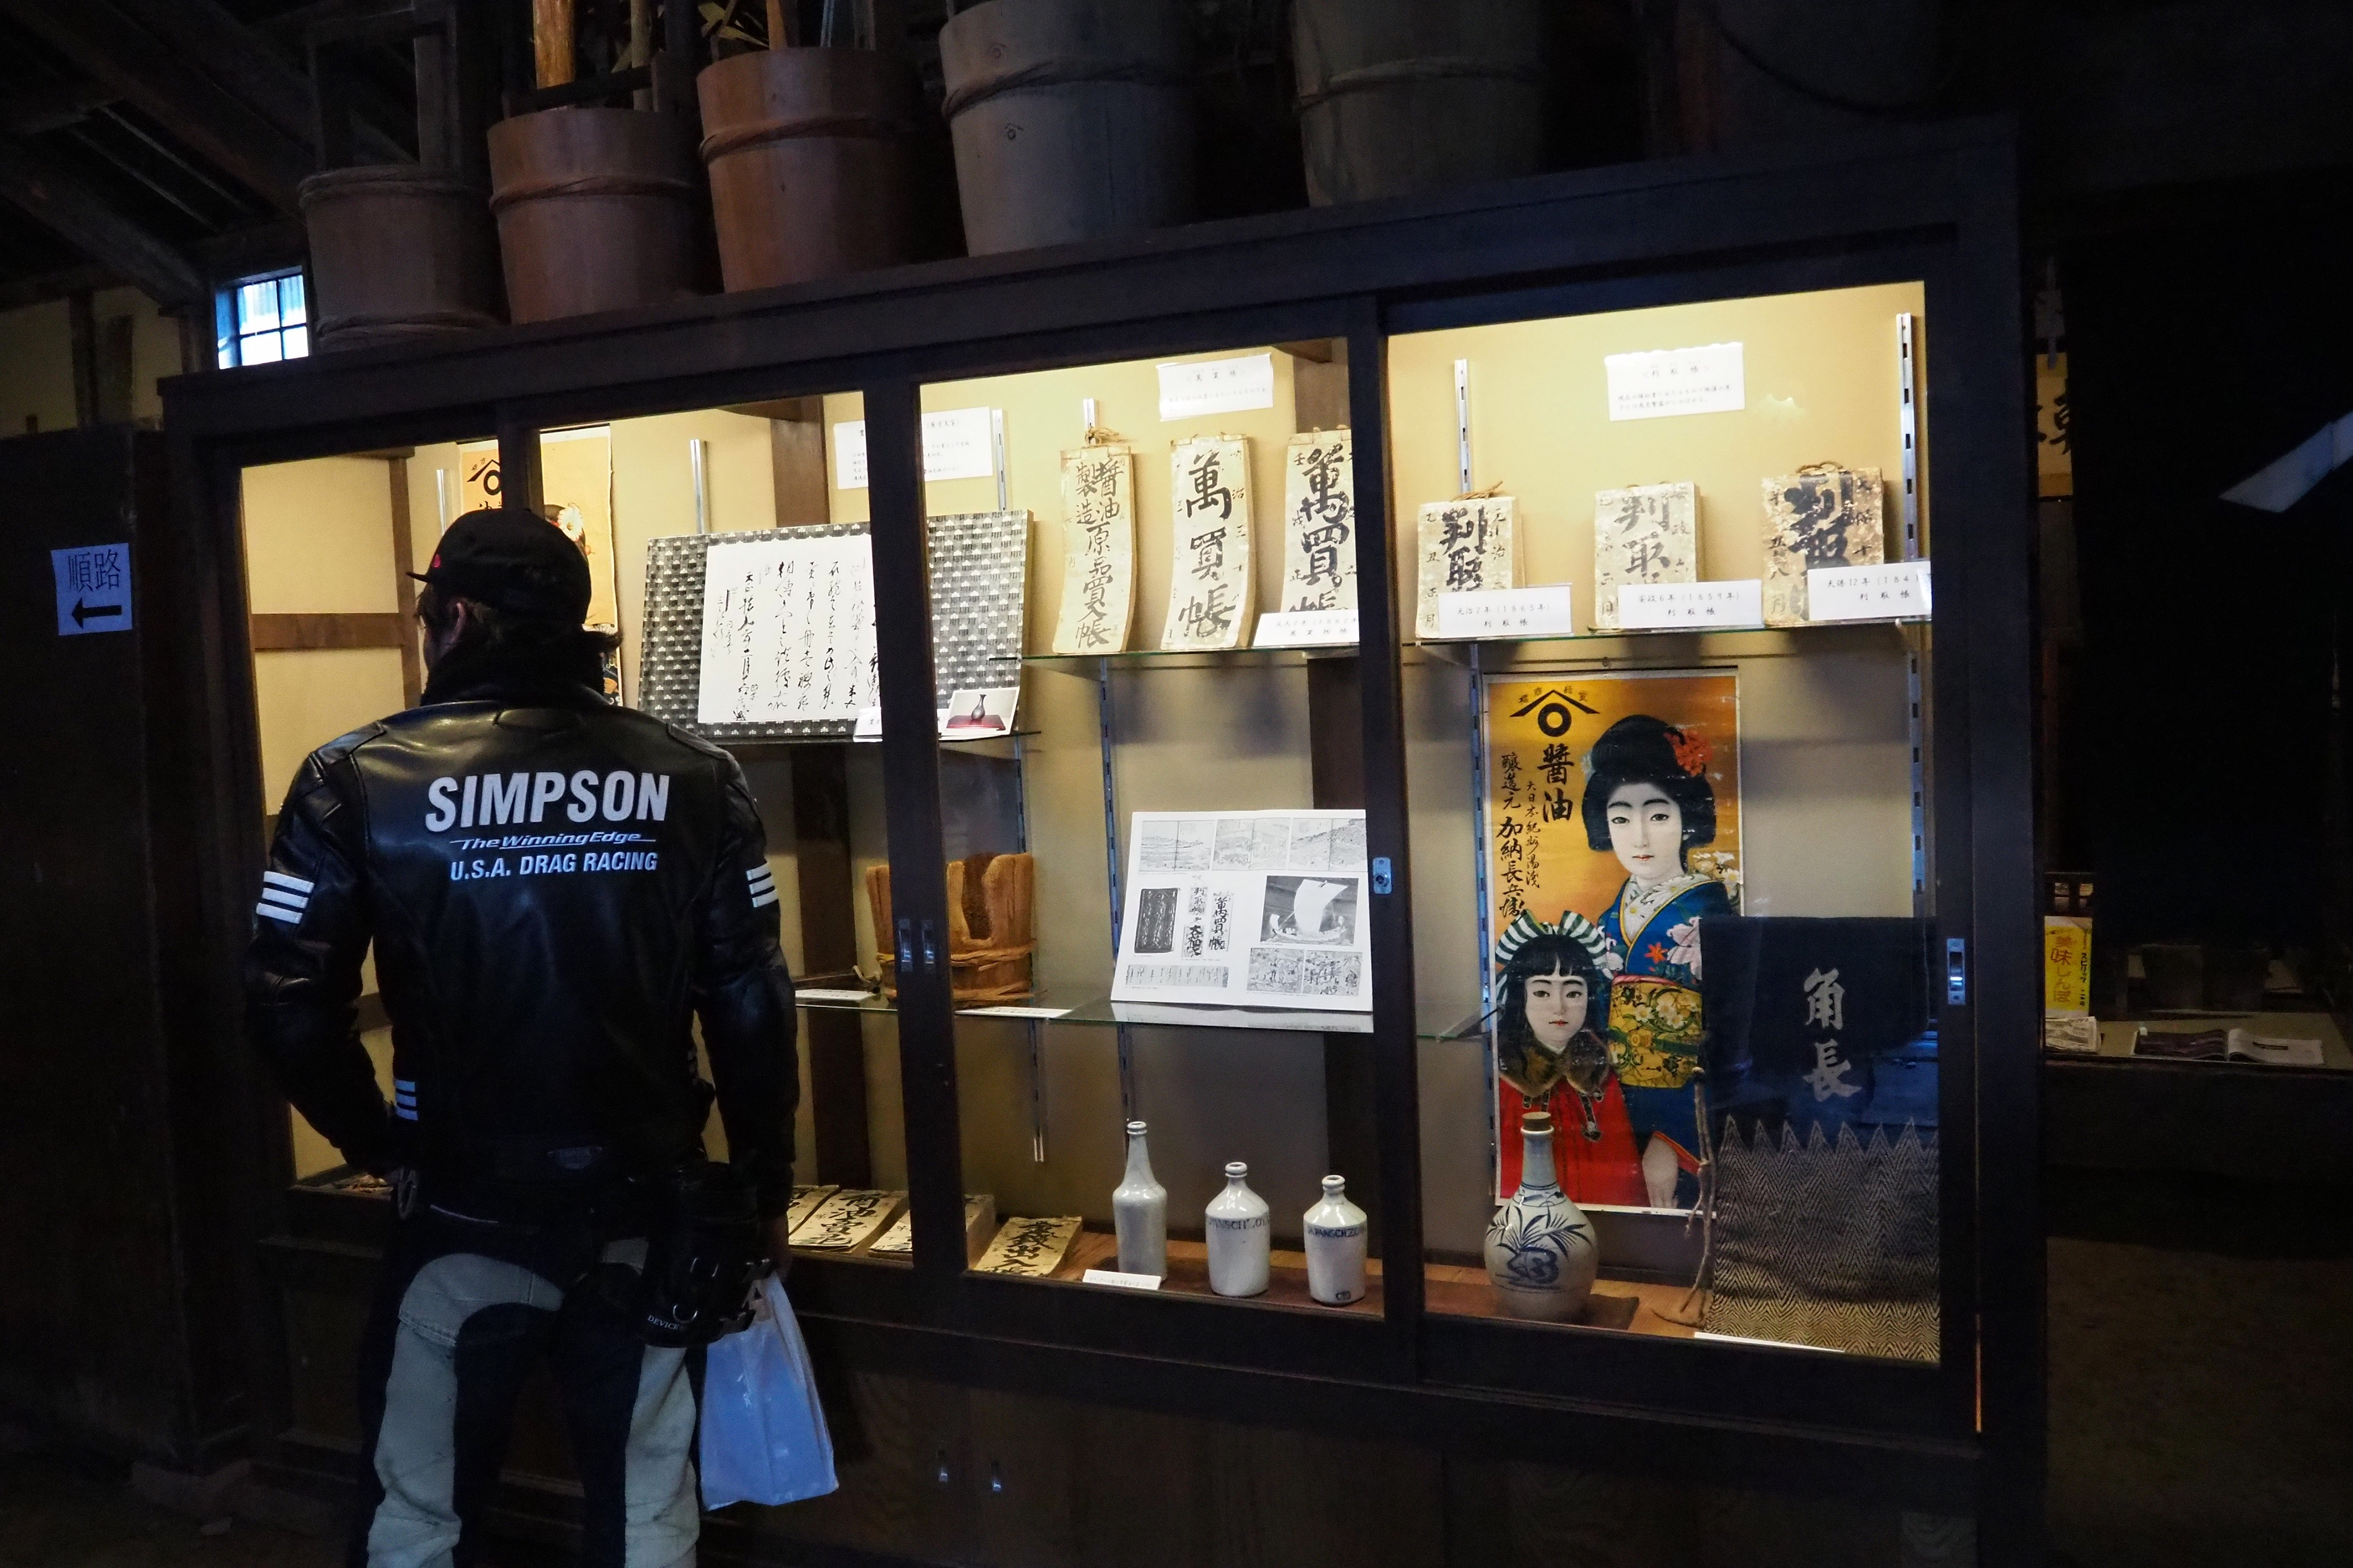 motorcycle-touring-blog-wakayama-yuasatown-soysauce-kadochou-museum-4.jpg